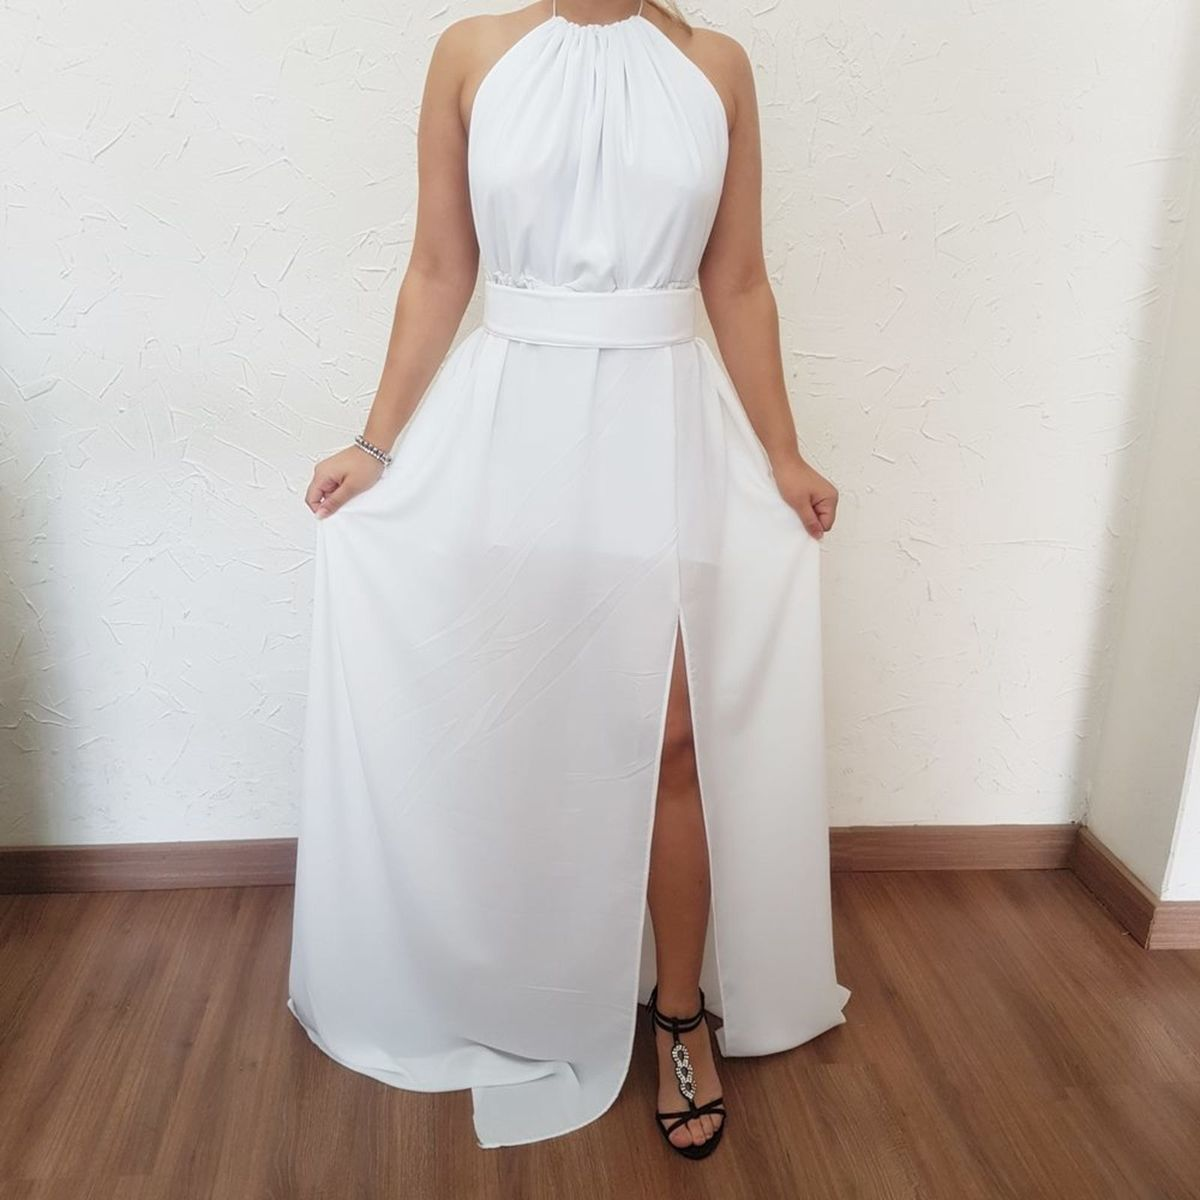 5b04a8850 Vestido Longo Fenda Frente Única Branco | Vestido de Festa Feminino My Way  Store Nunca Usado 26563676 | enjoei